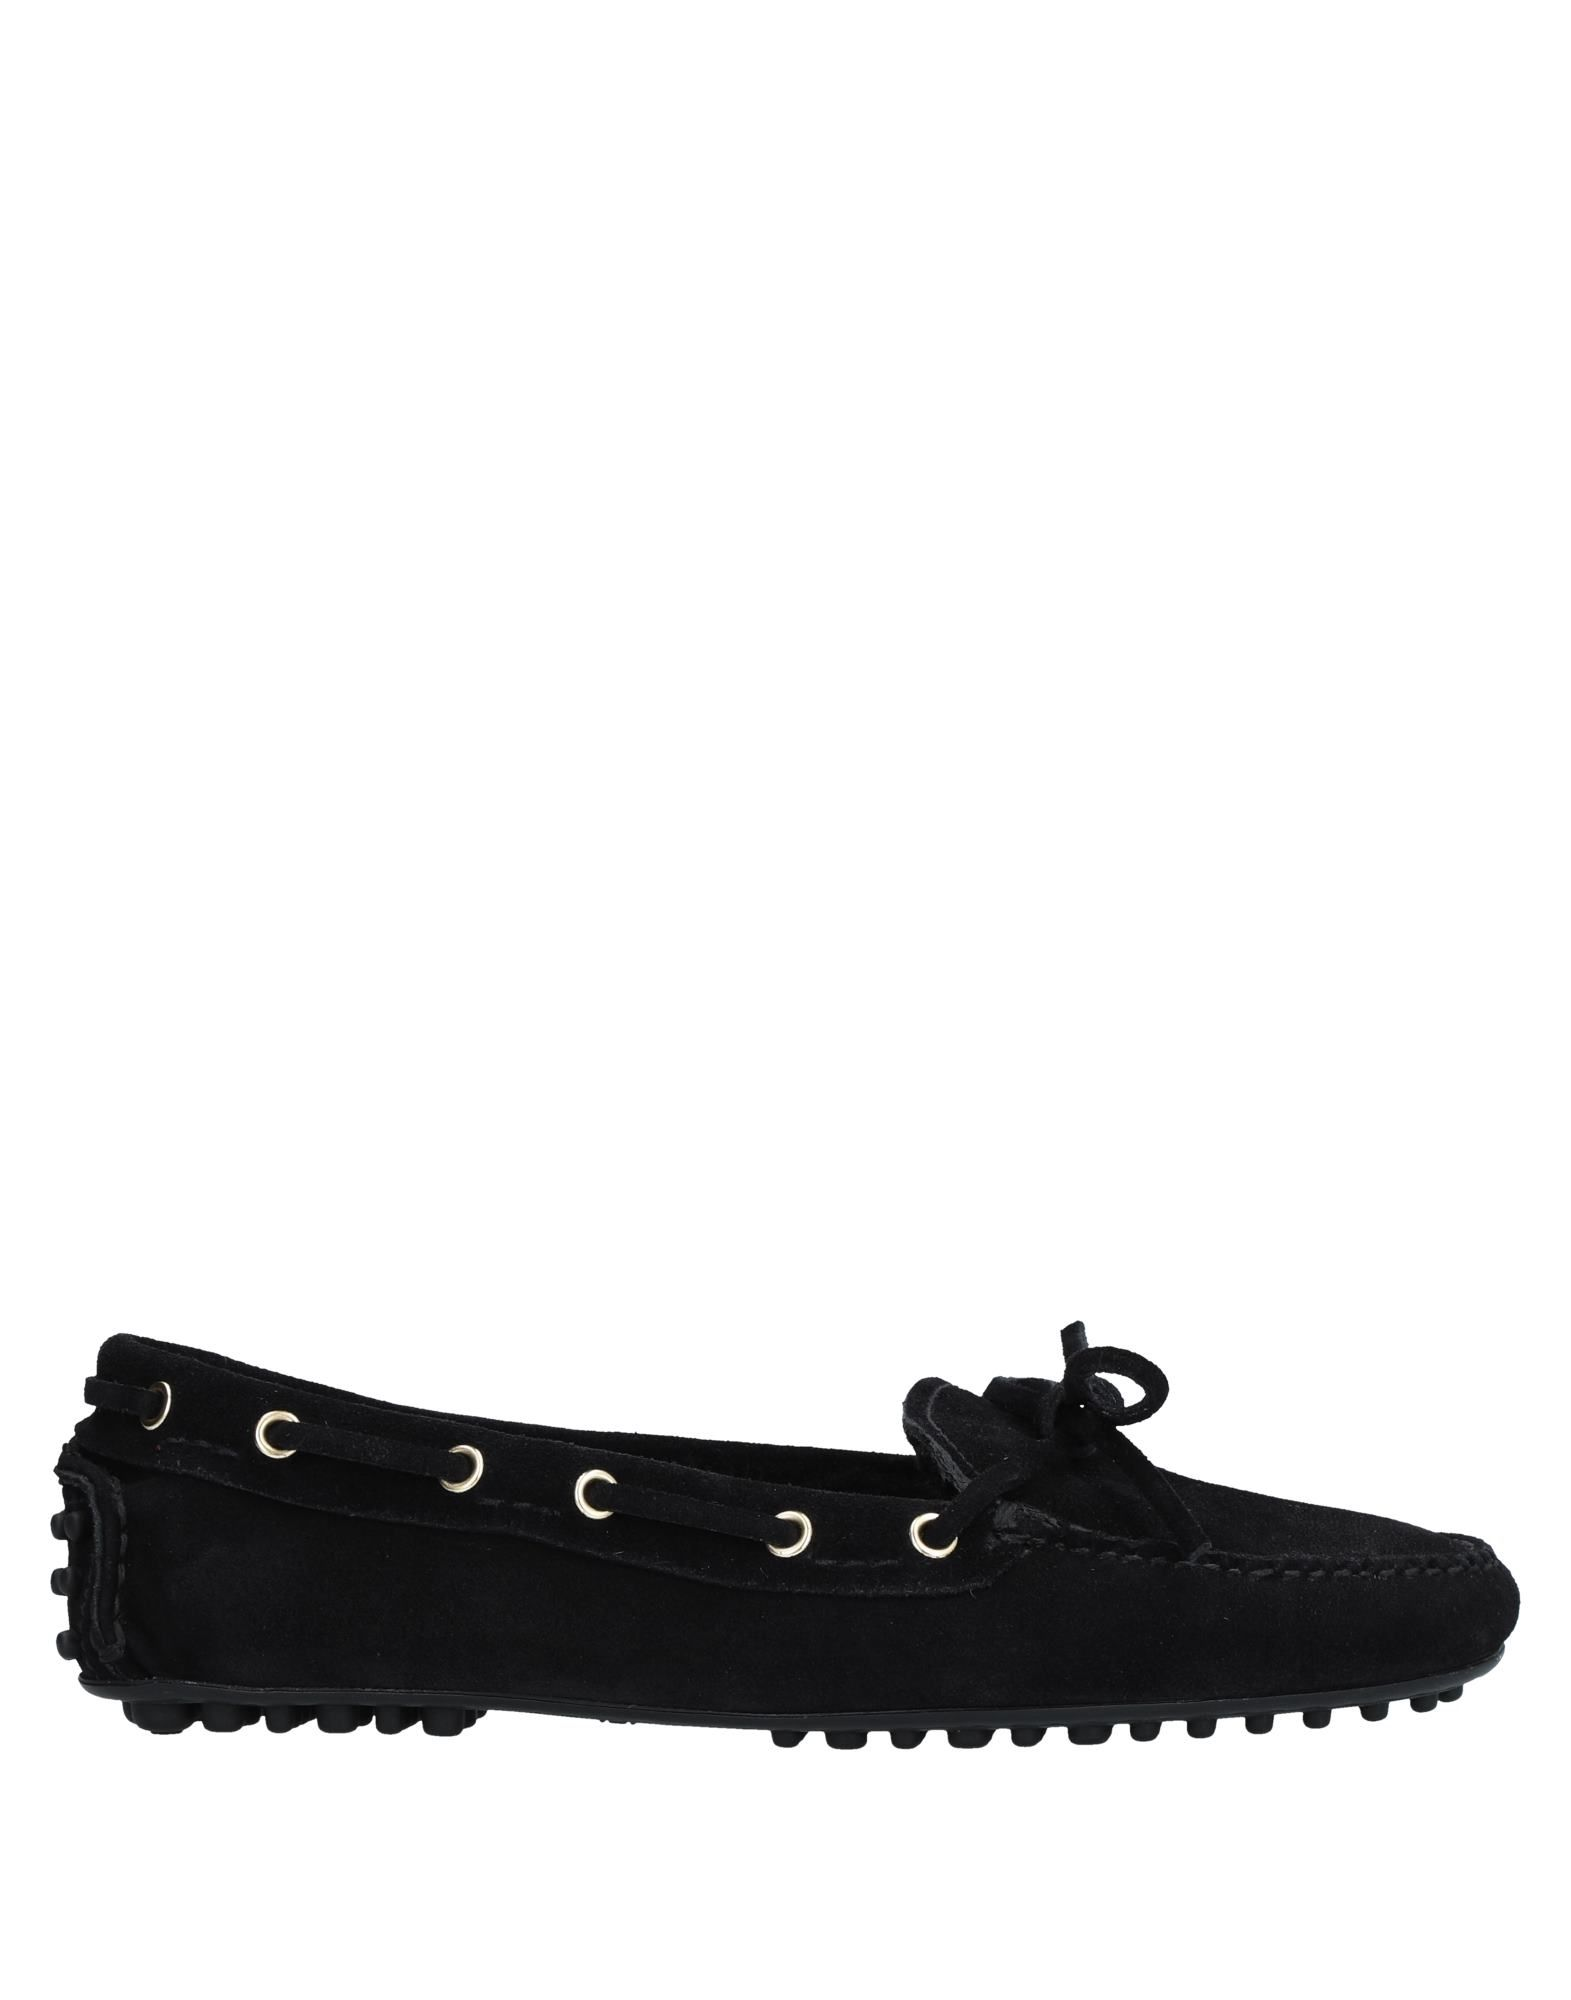 Carshoe Mokassins Damen  11542847RRGut aussehende strapazierfähige Schuhe